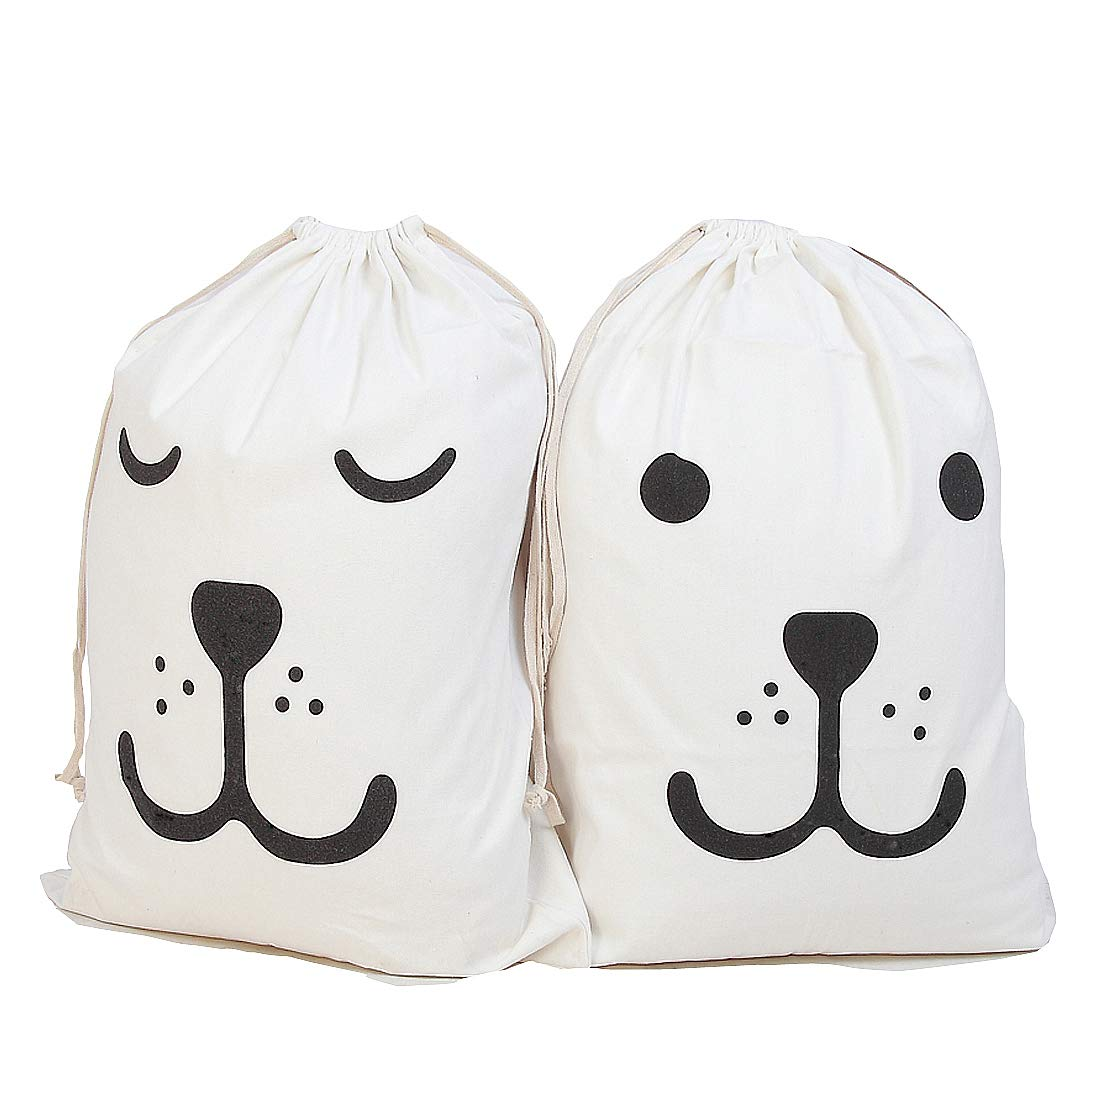 MeliUp Cute Large Canvas Storage Bag -2Pcs Drawstring Tote Bagsfor Clothing, Toys, Books, Gift Baskets, Closet Storage(Creamy White)